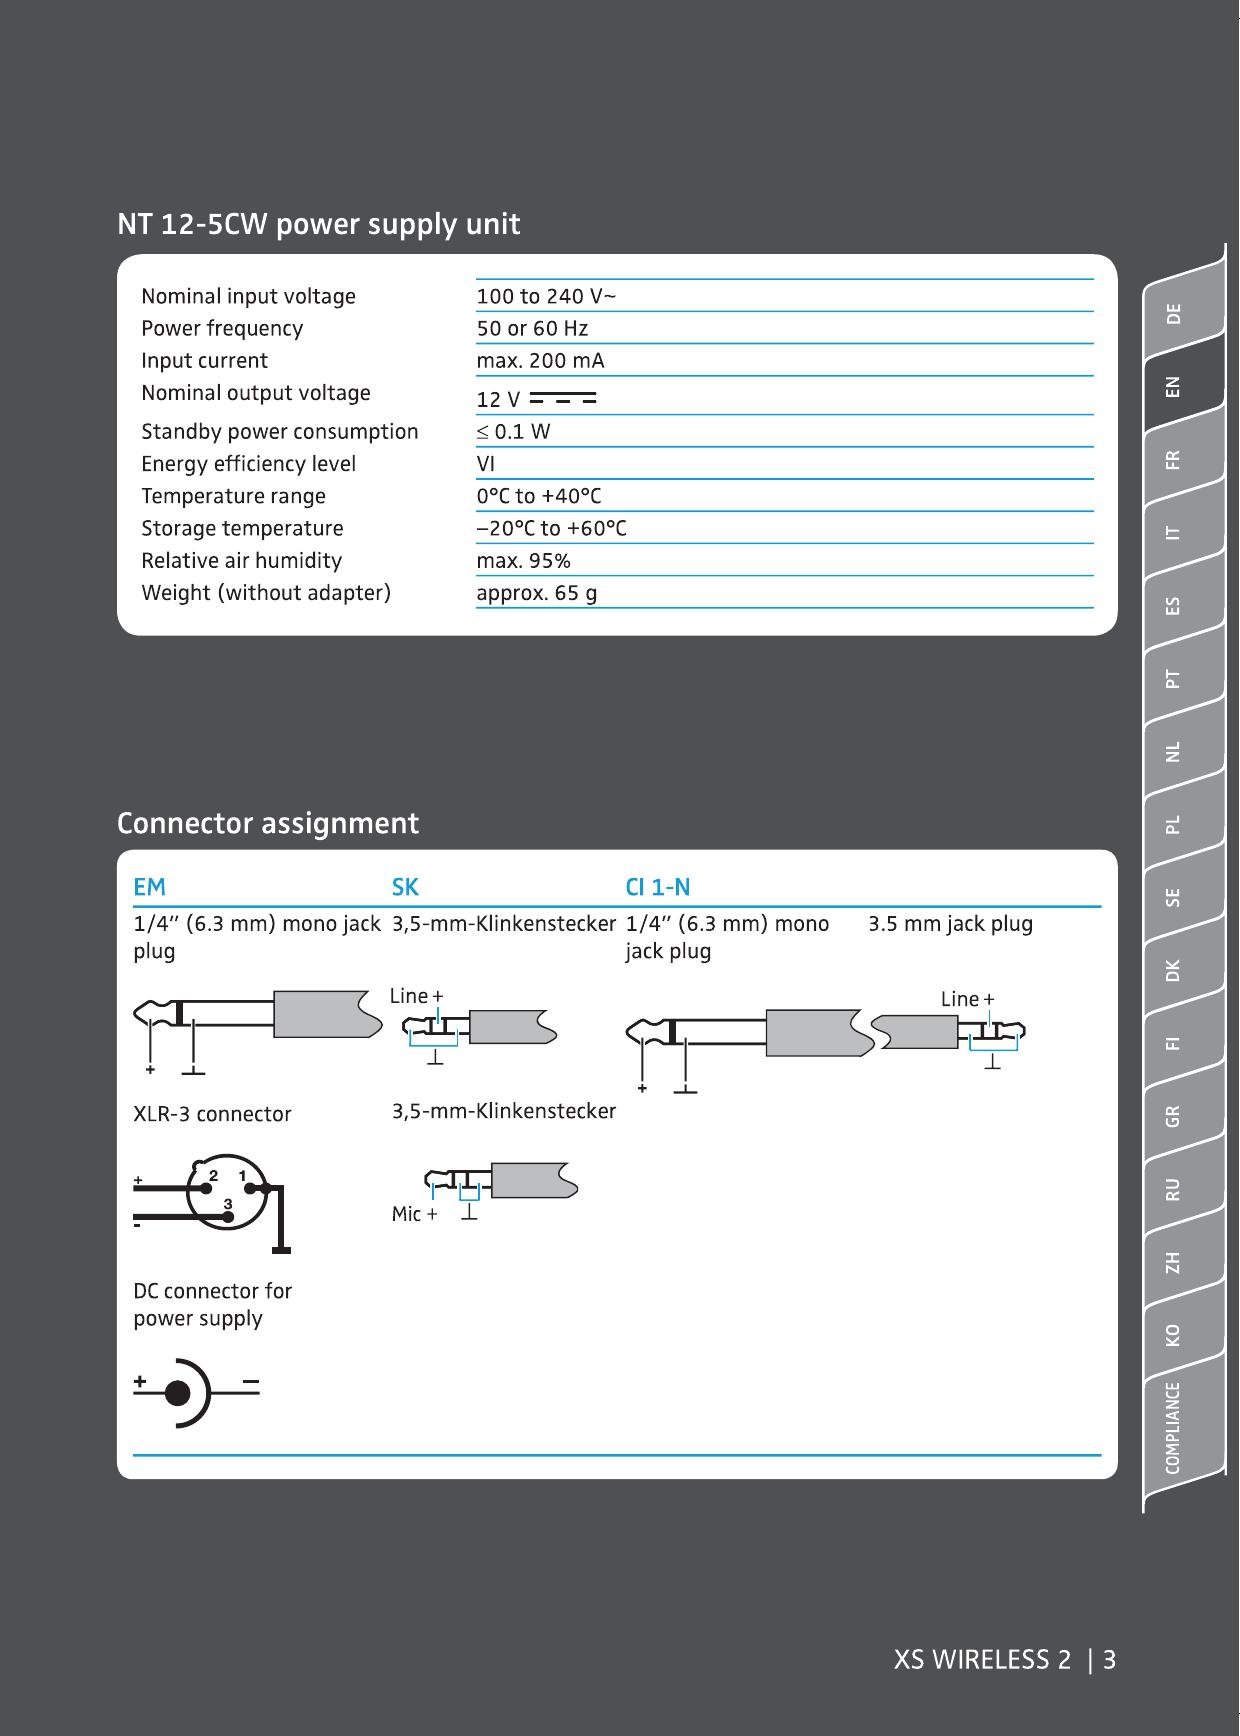 Sennheiser Ci1 Wiring Diagram Electrical Diagrams Microphone Electronic Emxsw2 Wireless Transmitter User Manual